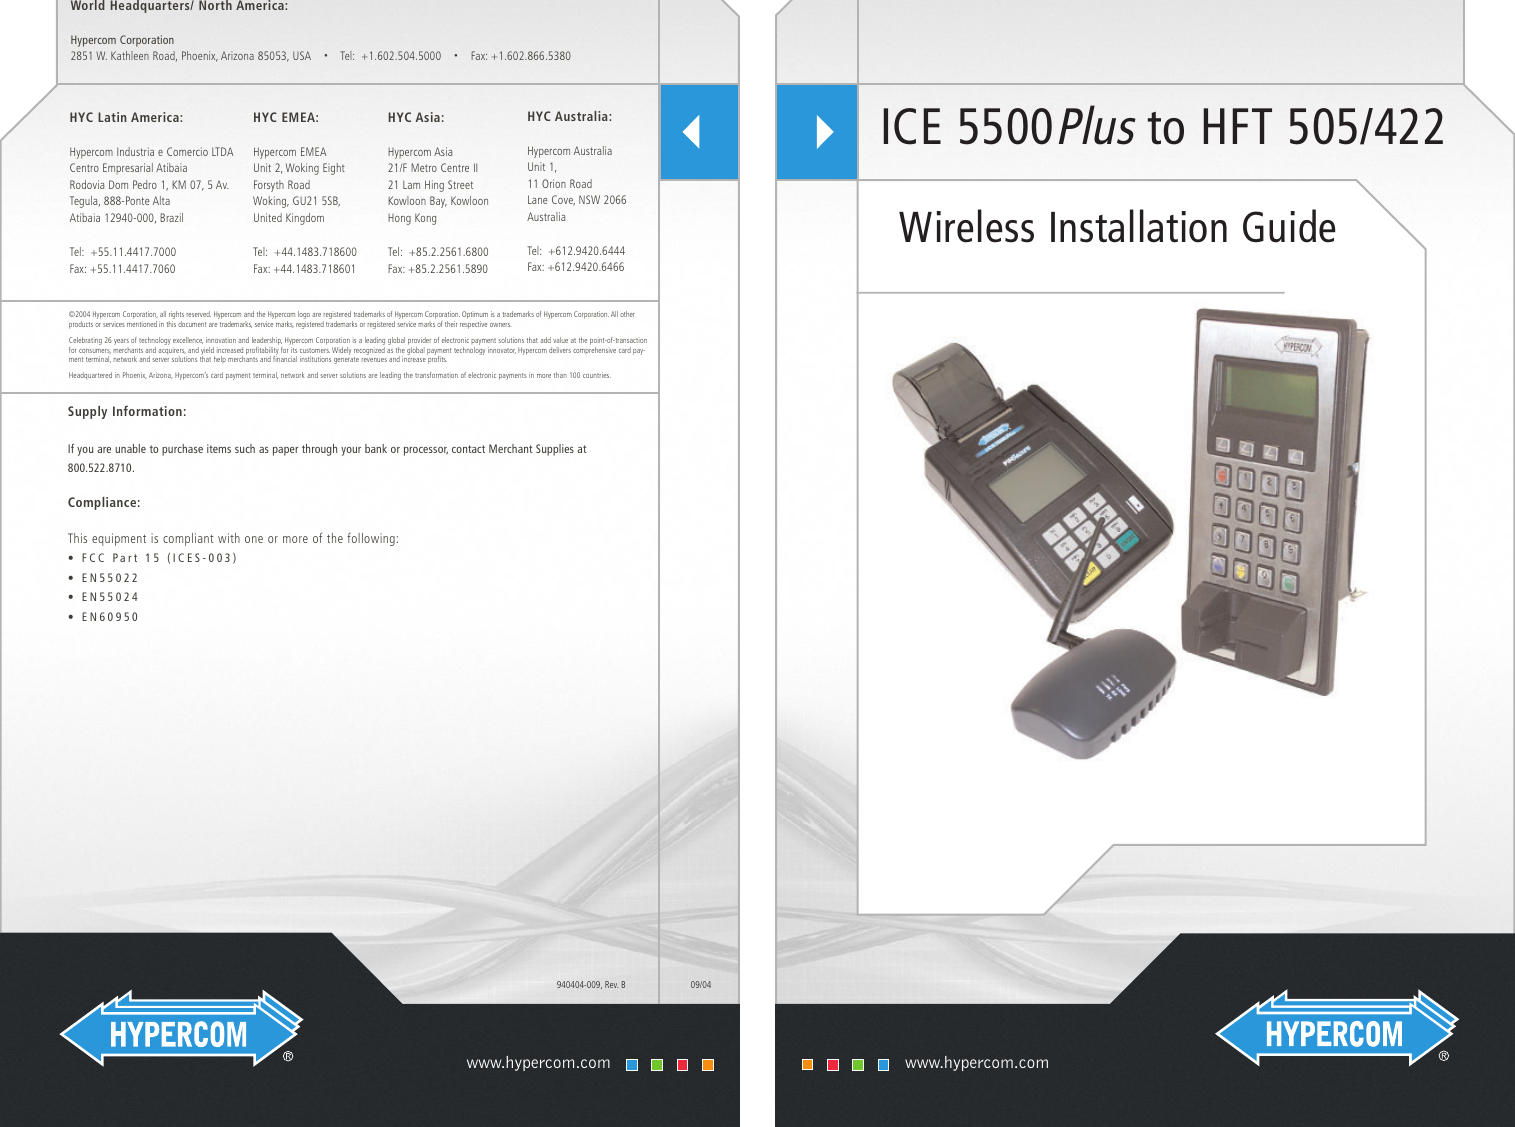 hypercom terminal hft 505 422 users manual ice 5500plus to 505 422 rh usermanual wiki New Balance Manuals User Guide Icon